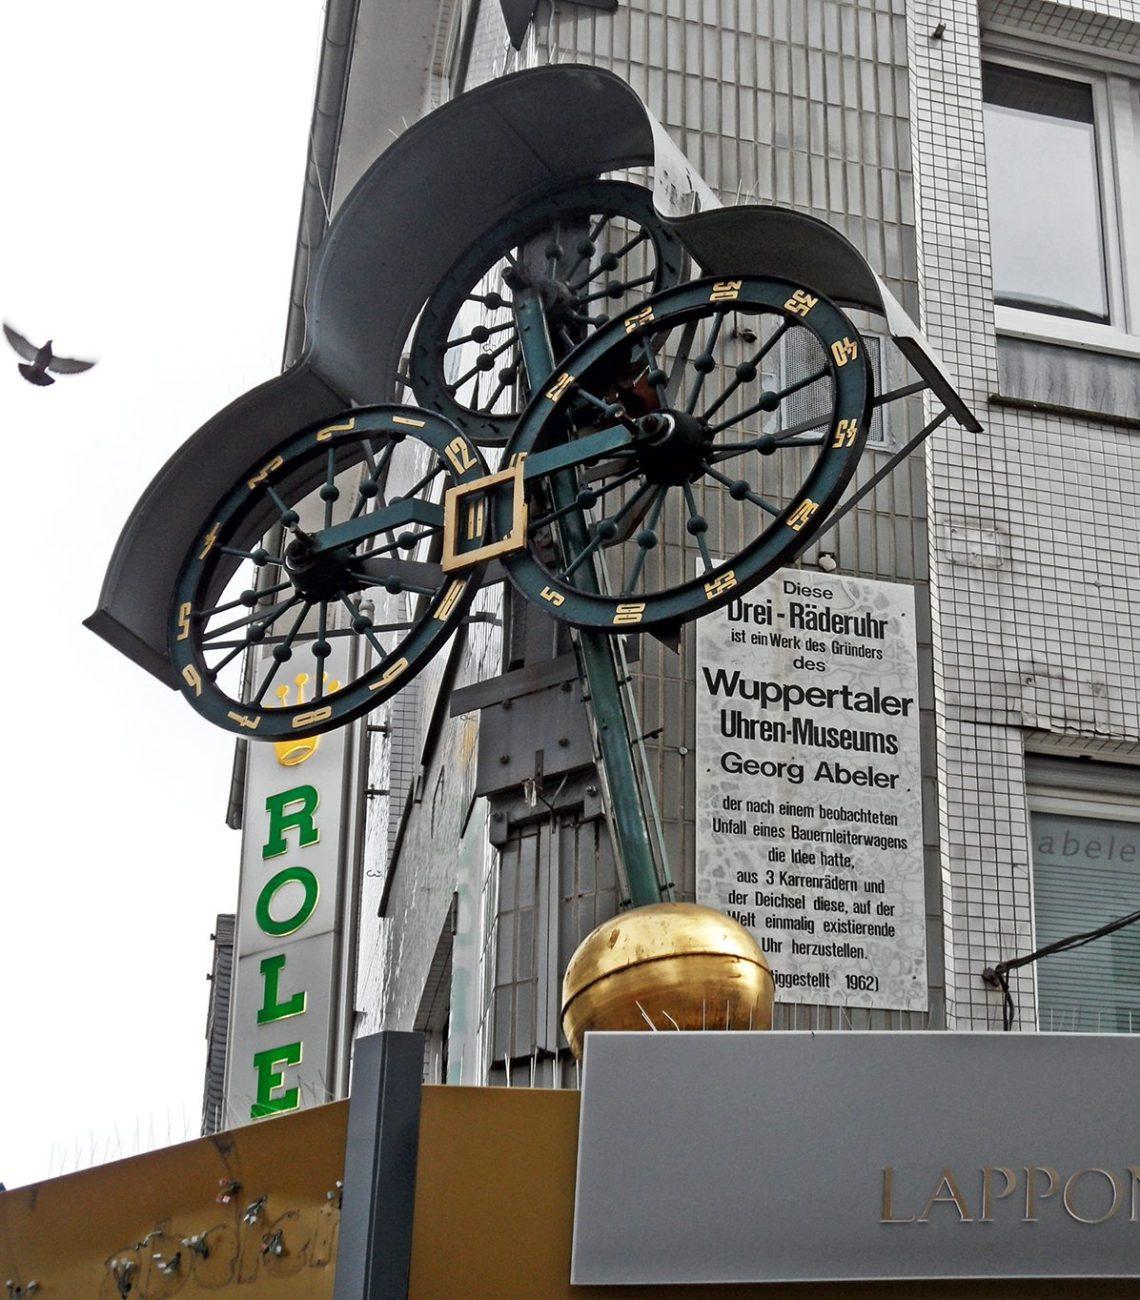 Wuppertaler Uhrenmuseum, Drei-Räder-Uhr, 13 februari 2016. Foto met dank aan onnola, CC BY-SA 2.0